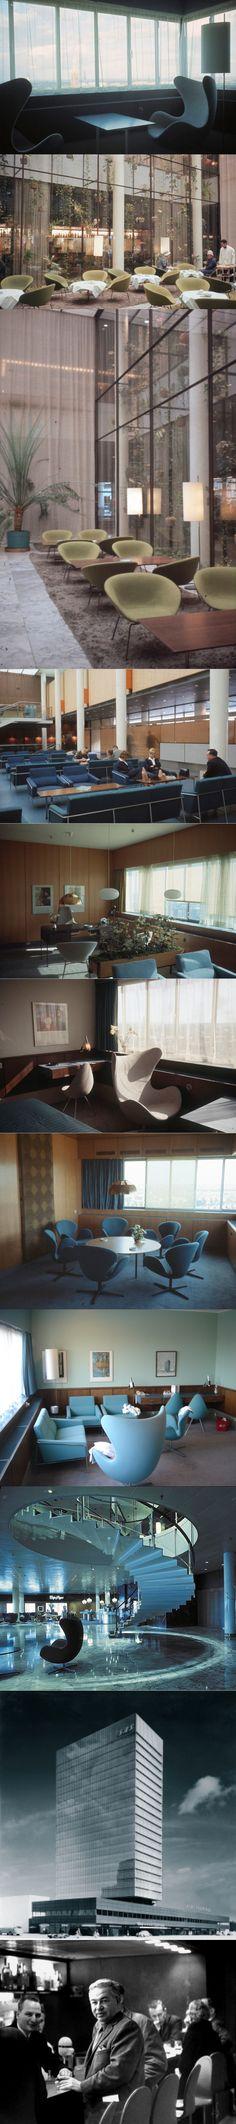 1958-1960 Arne Jacobsen - SAS Royal Hotel / Copenhagen Denmark / 3320 Swan chair - floor lamp / 3300 Series chair & sofa / Drop chair / 3320 Swan chair / blue green